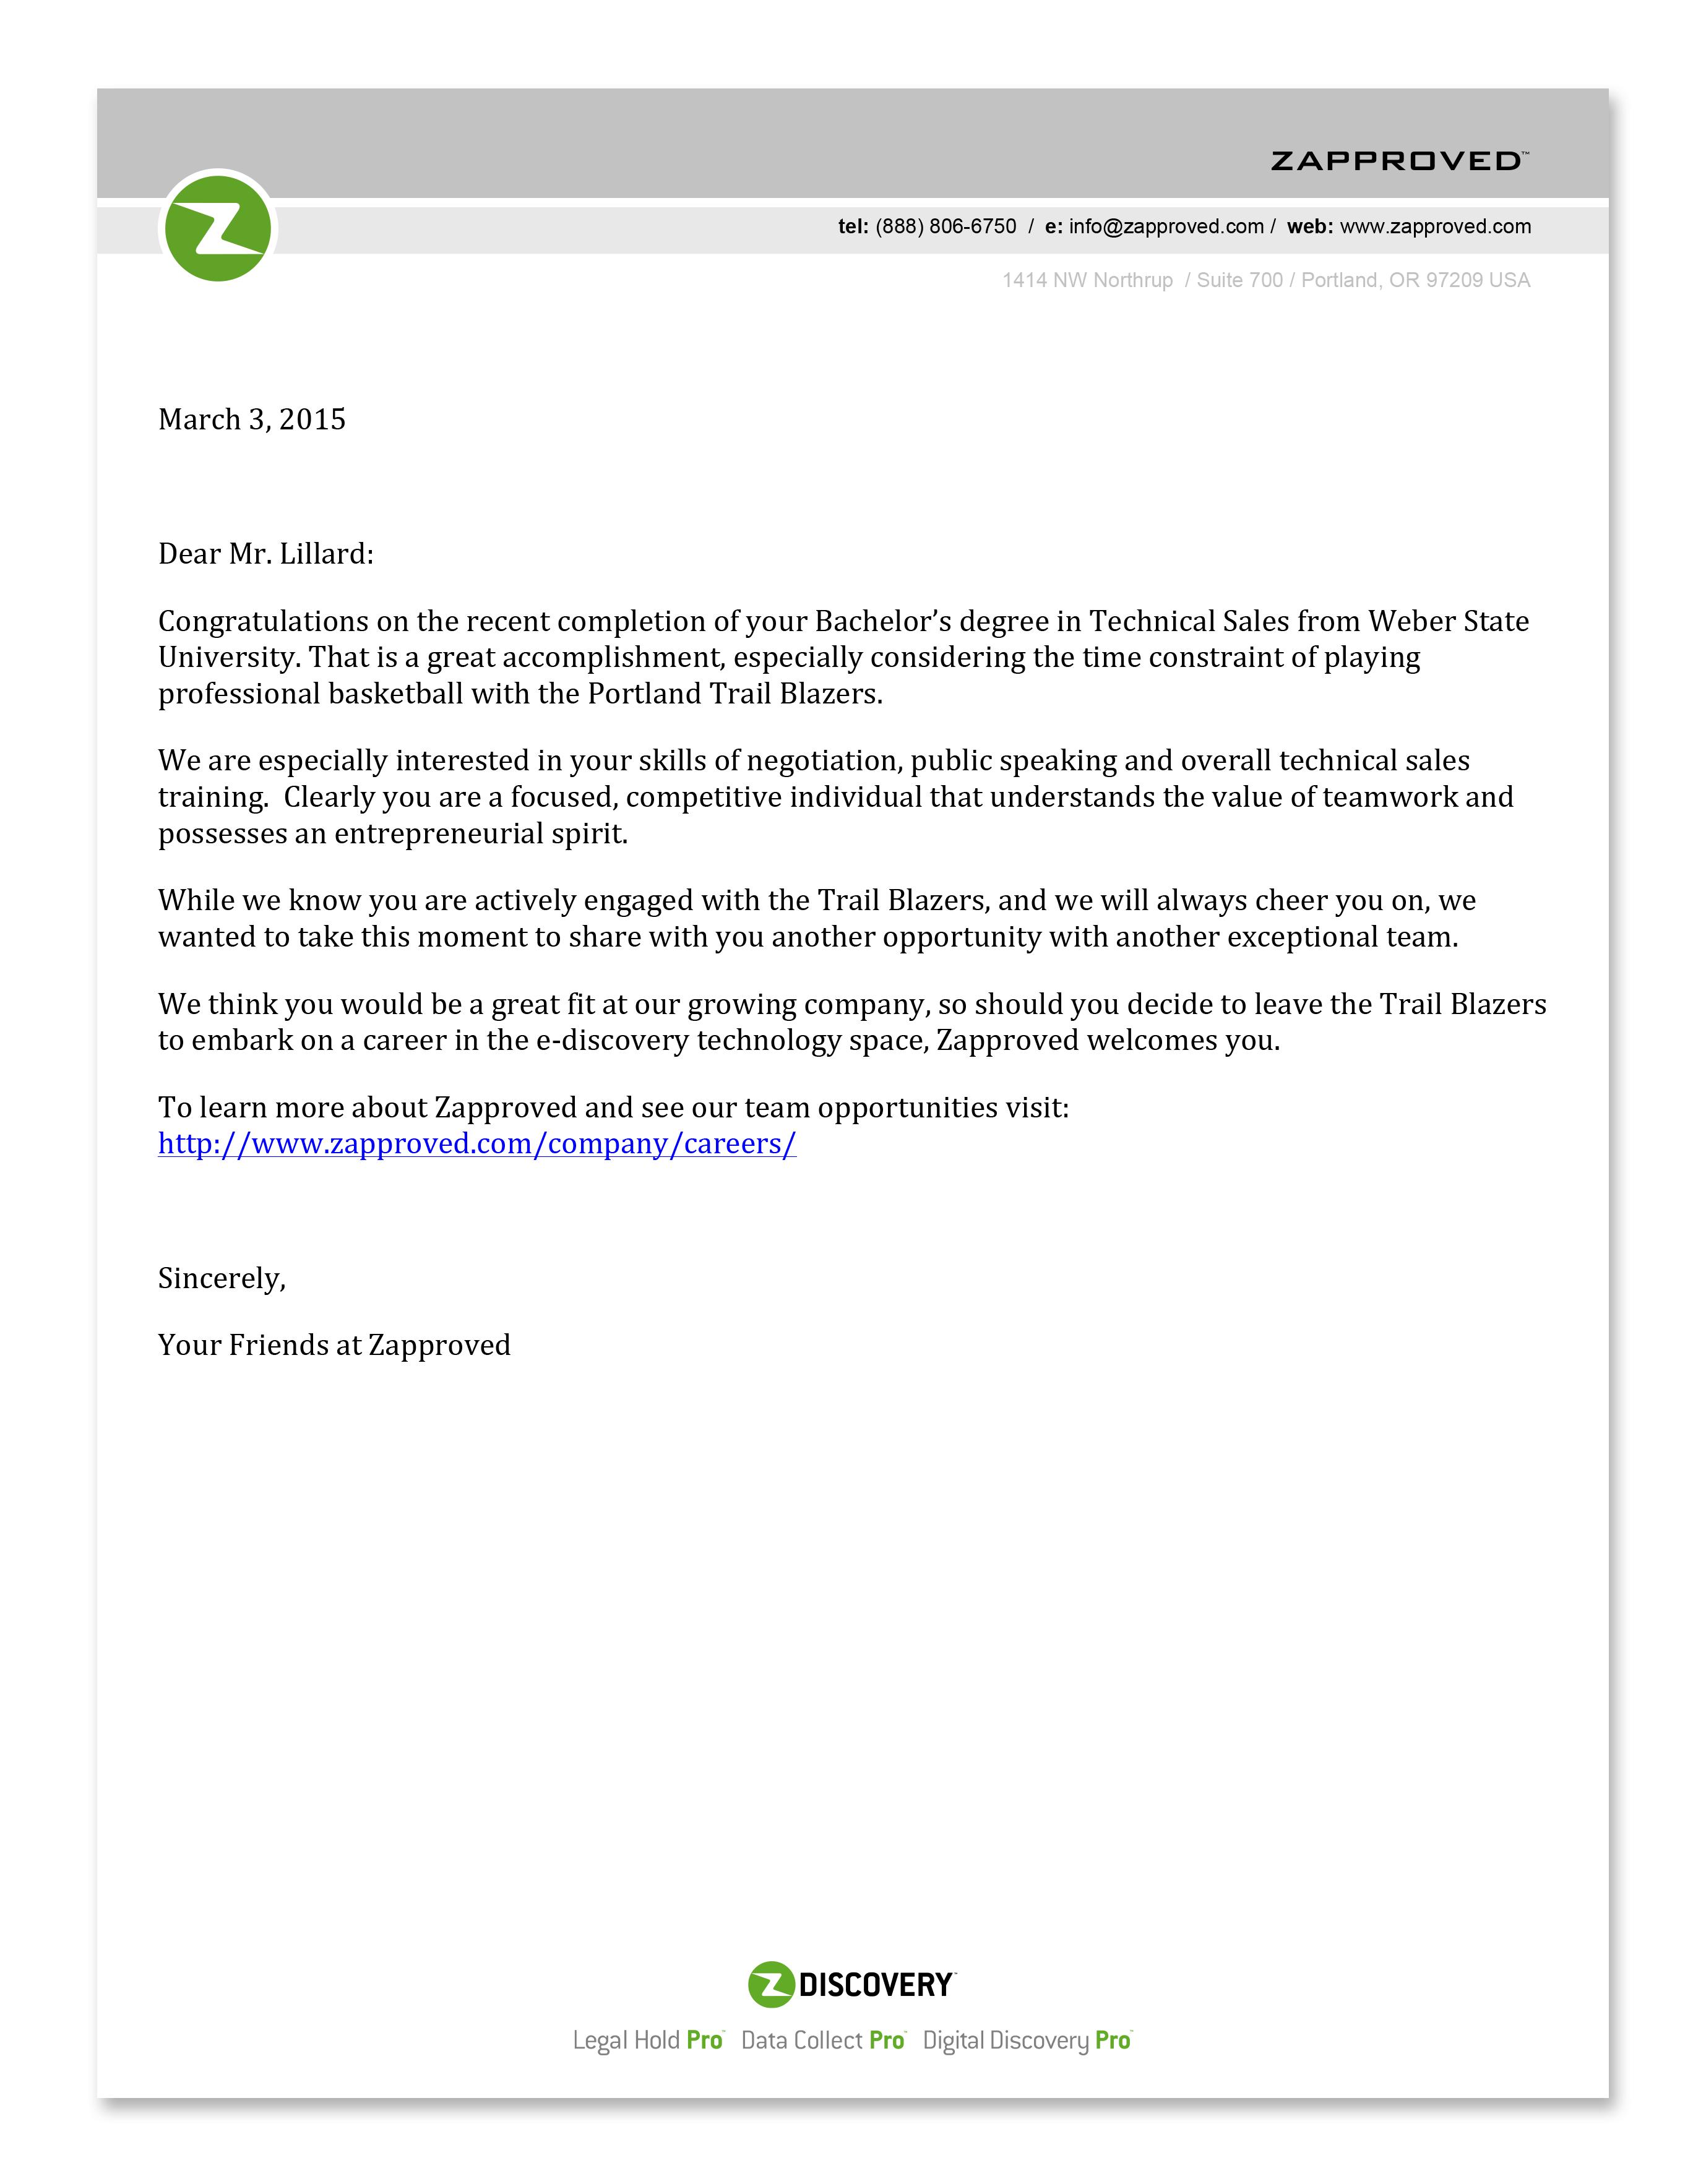 Zapproved Damian Lillard Job Letter